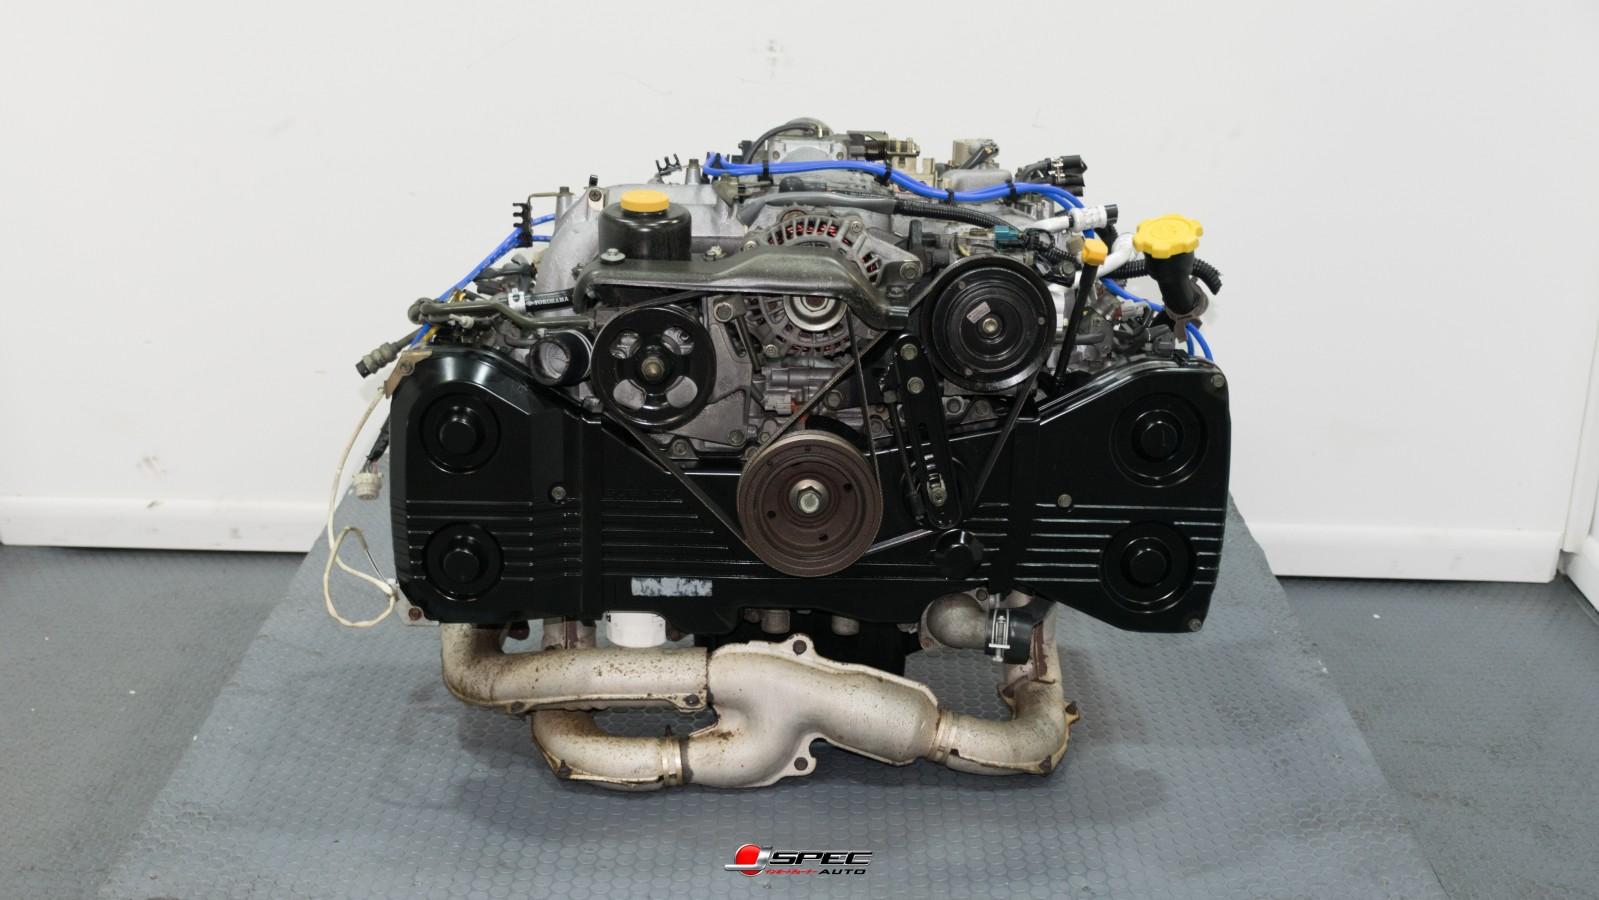 JDM SUBARU EJ25 MOTOR DOHC QUAD CAM 2 5L ENGINE EJ25D MOTOR 1996-1999  SUBARU LEGACY & 1998 FORESTER